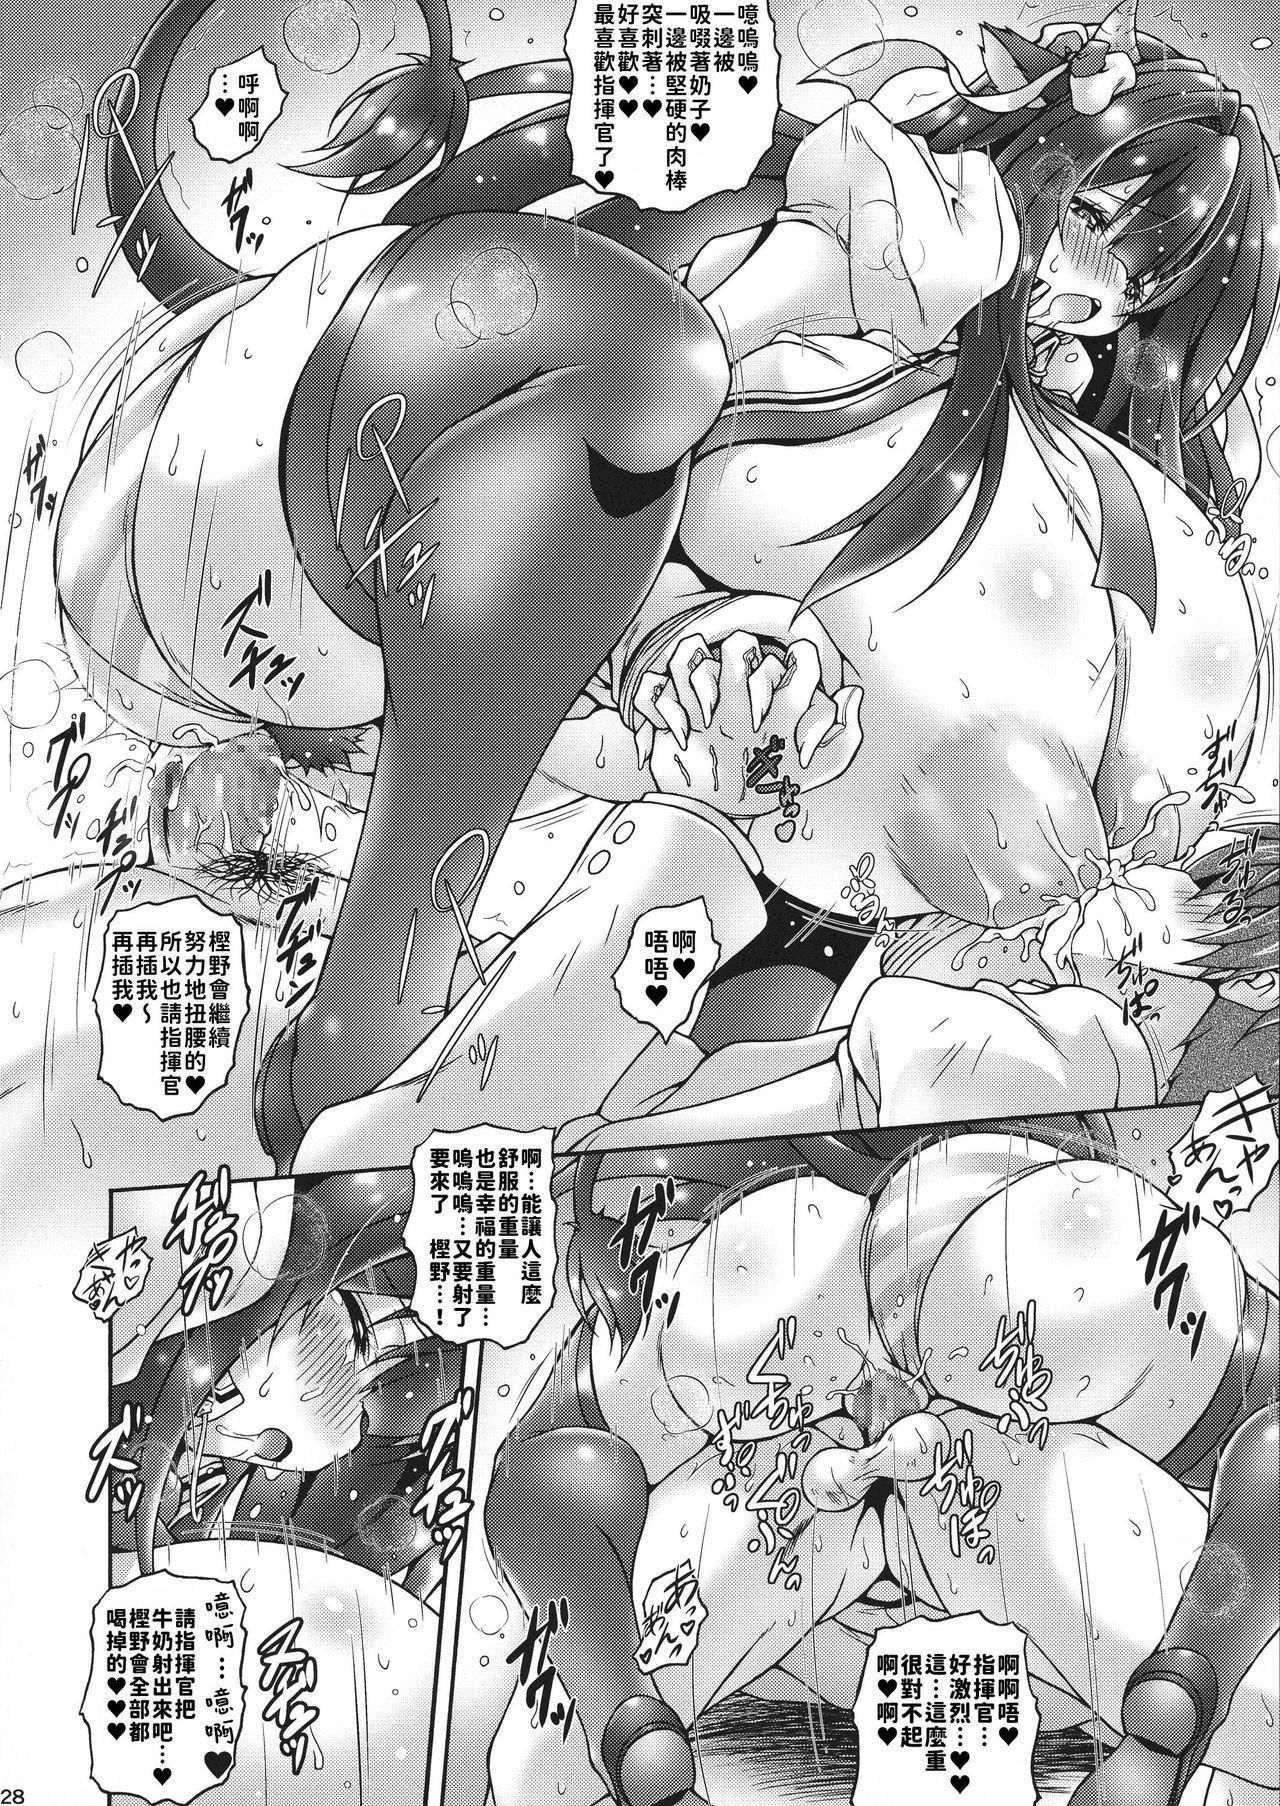 Tayu-Tayu Presure Milk Time 27